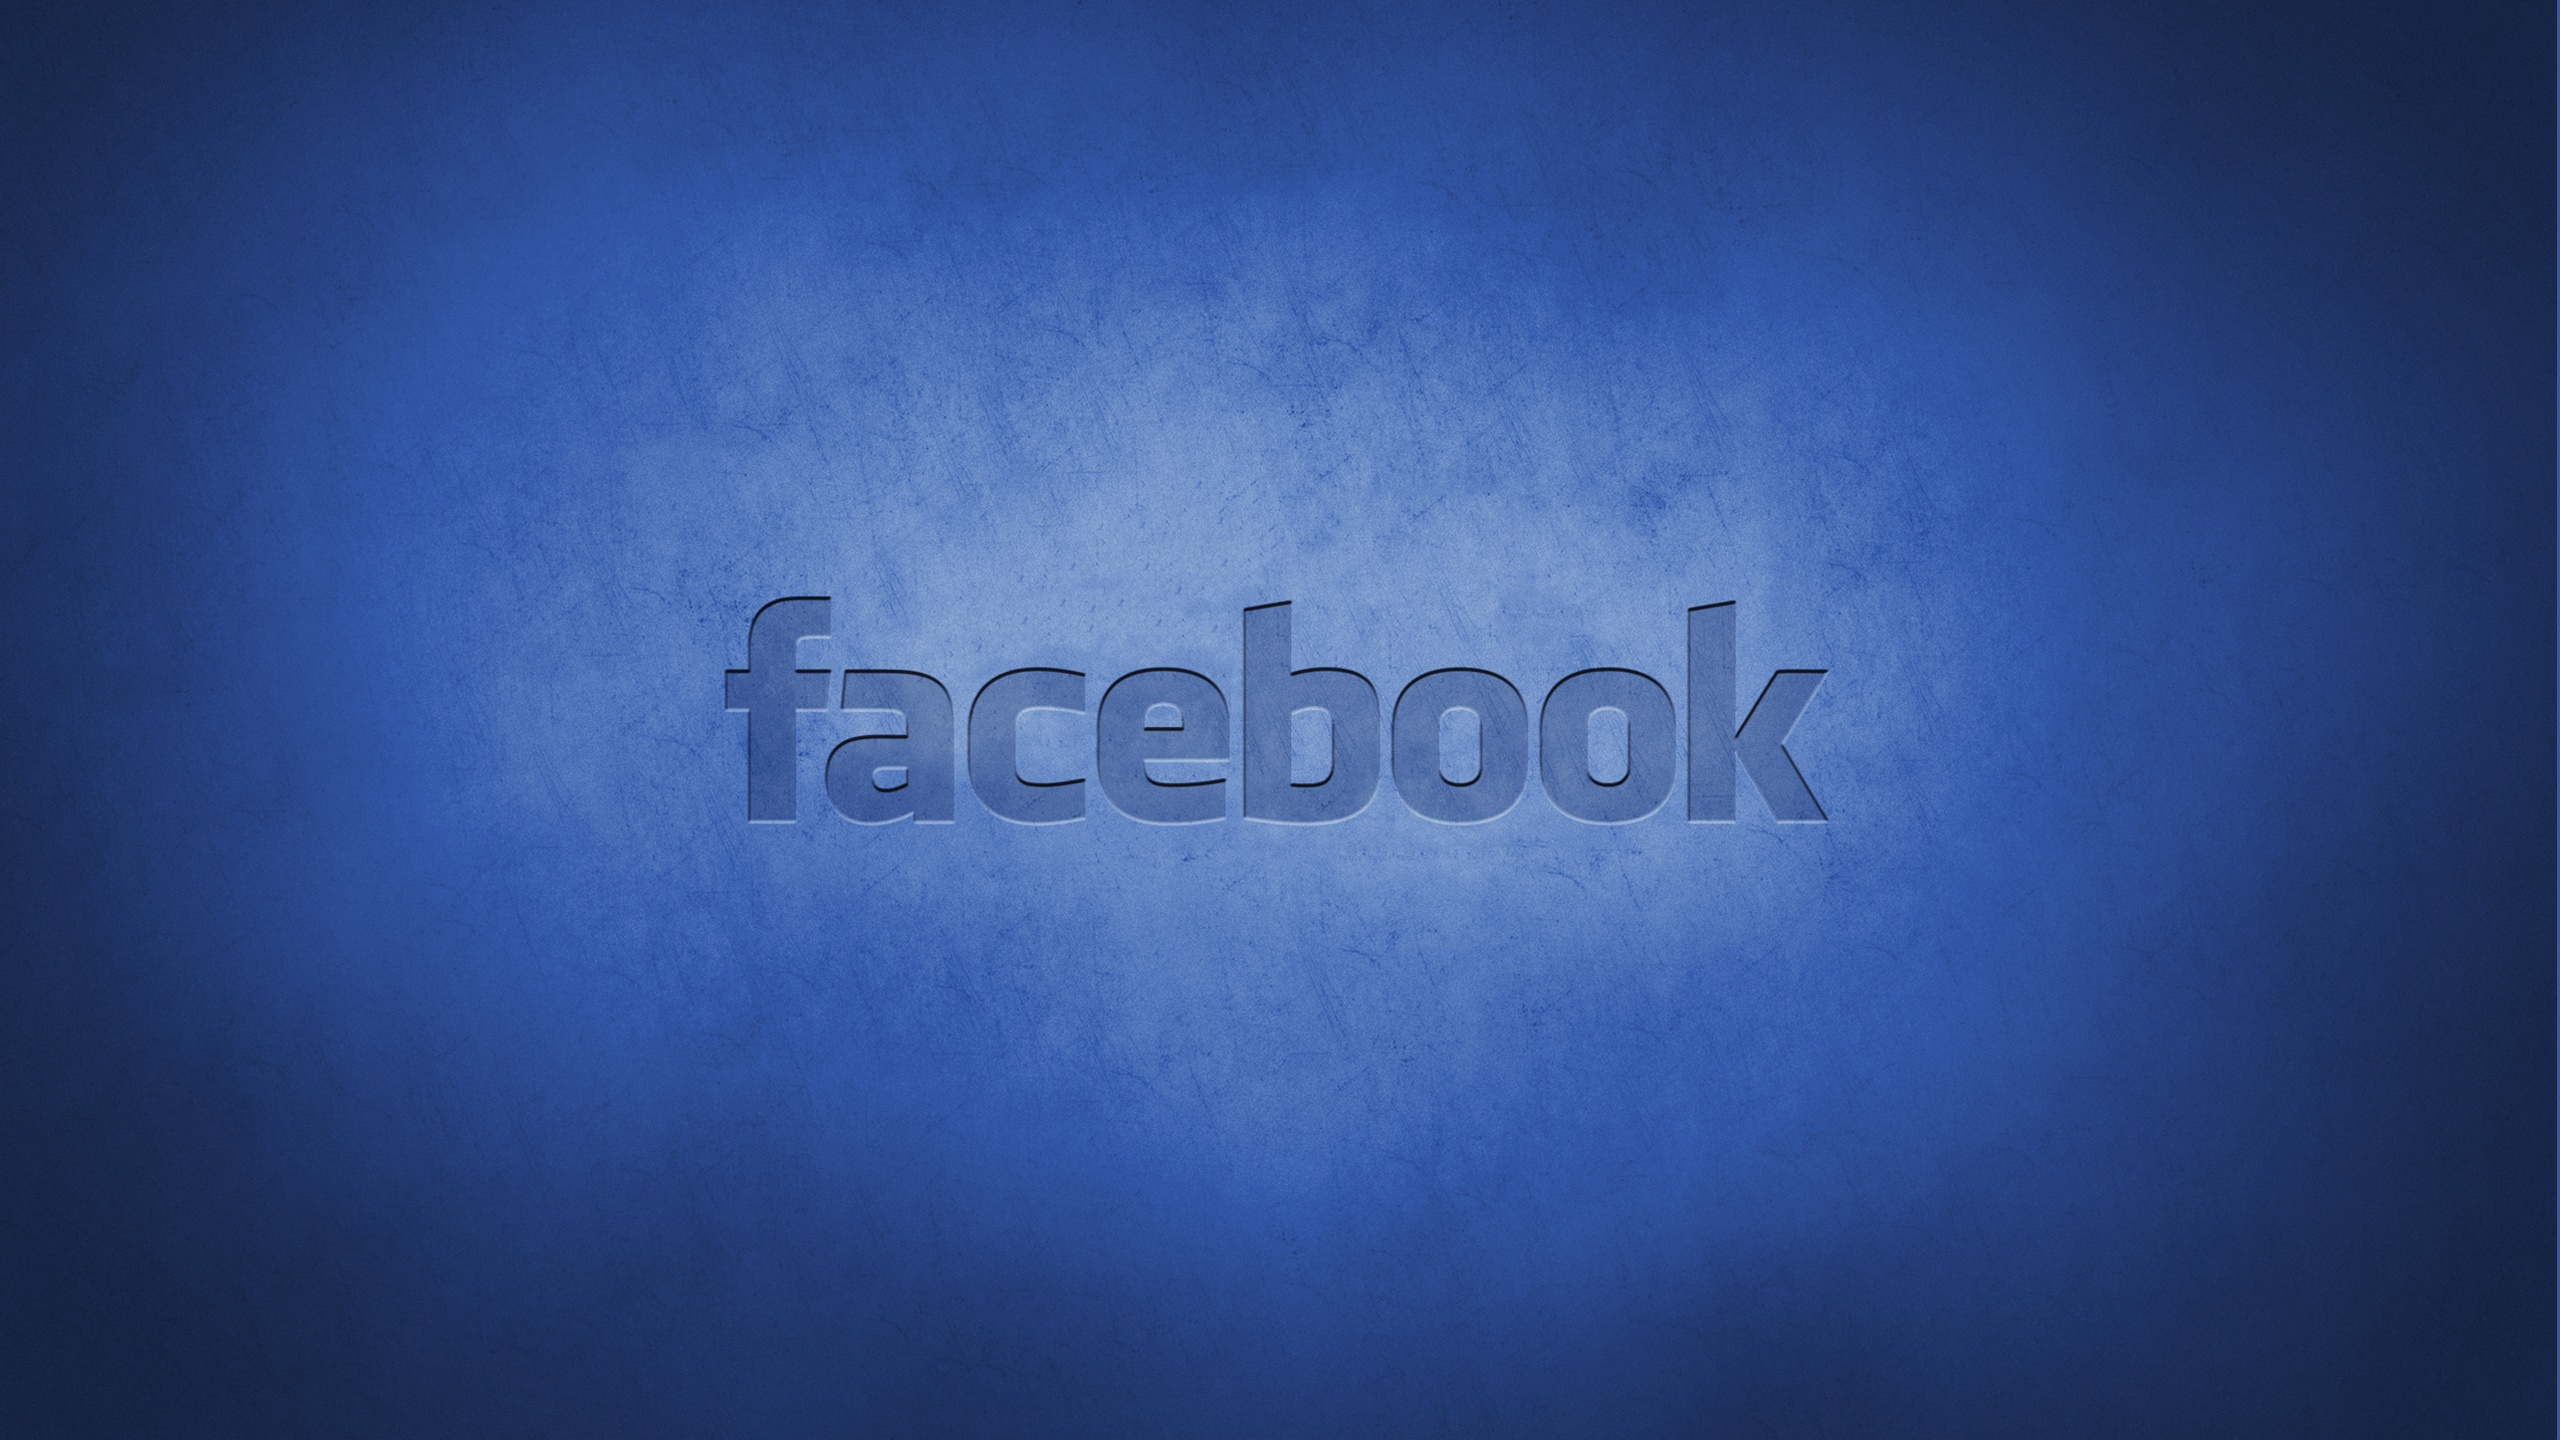 Facebook Wallpapers 19 2560 X 1440